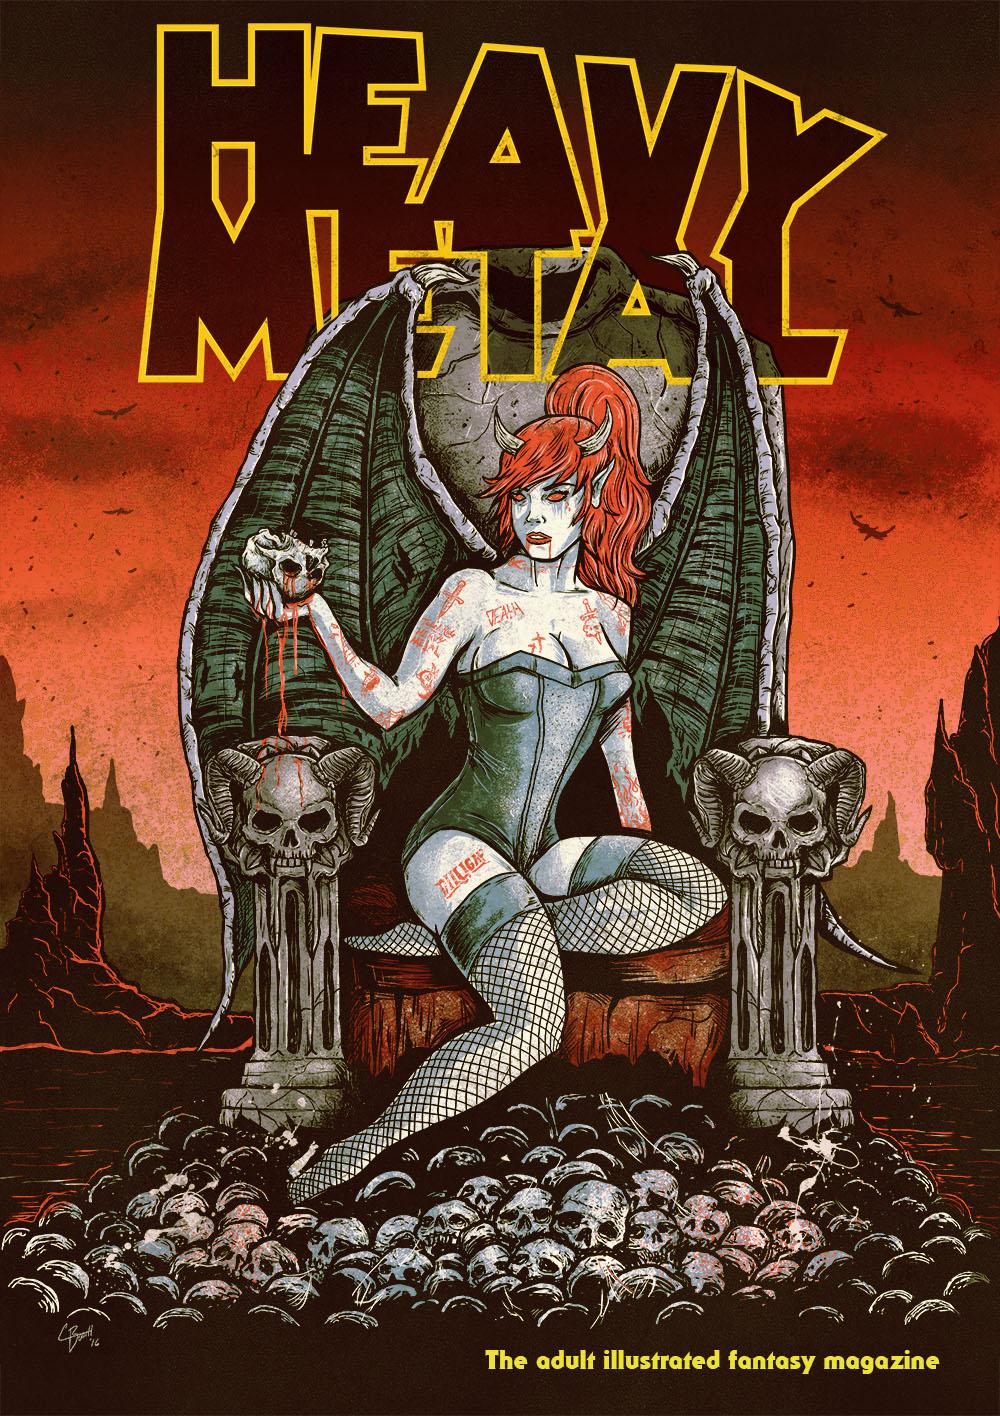 Heavymetal attach